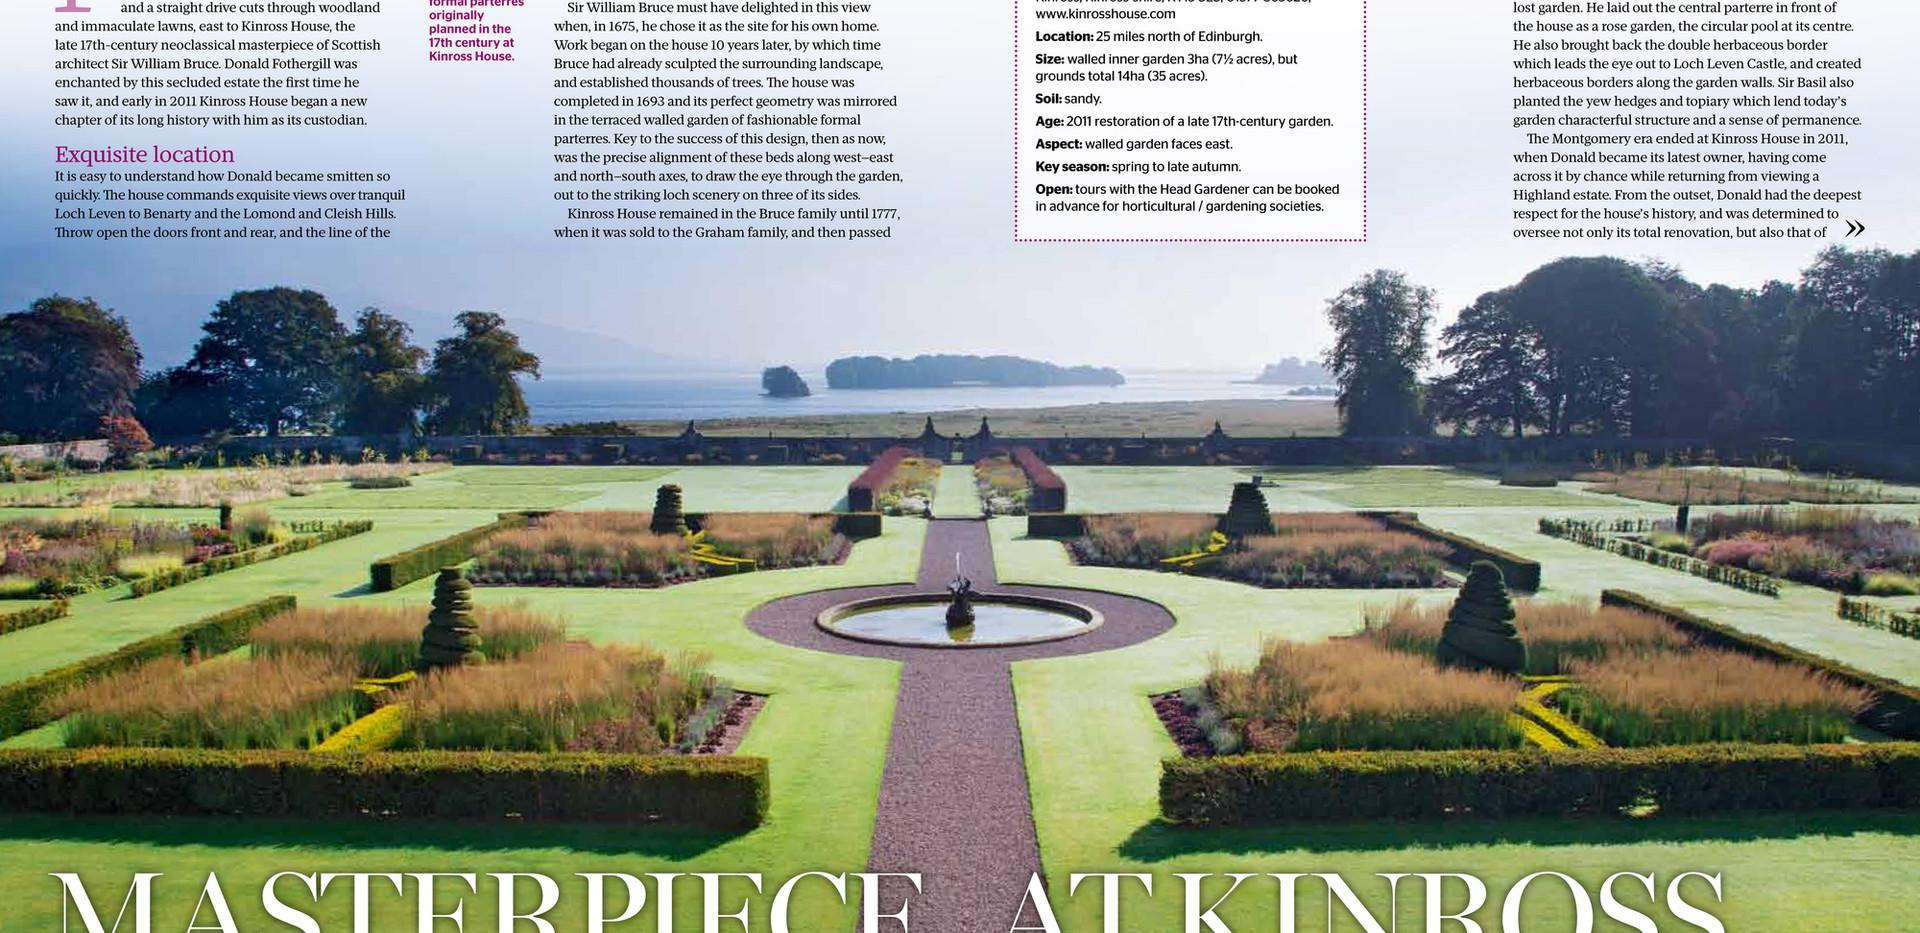 Kinross House Gardens, designed by Alistair Baldwin, The Garden, RHS Magazine September 2016, Page 1